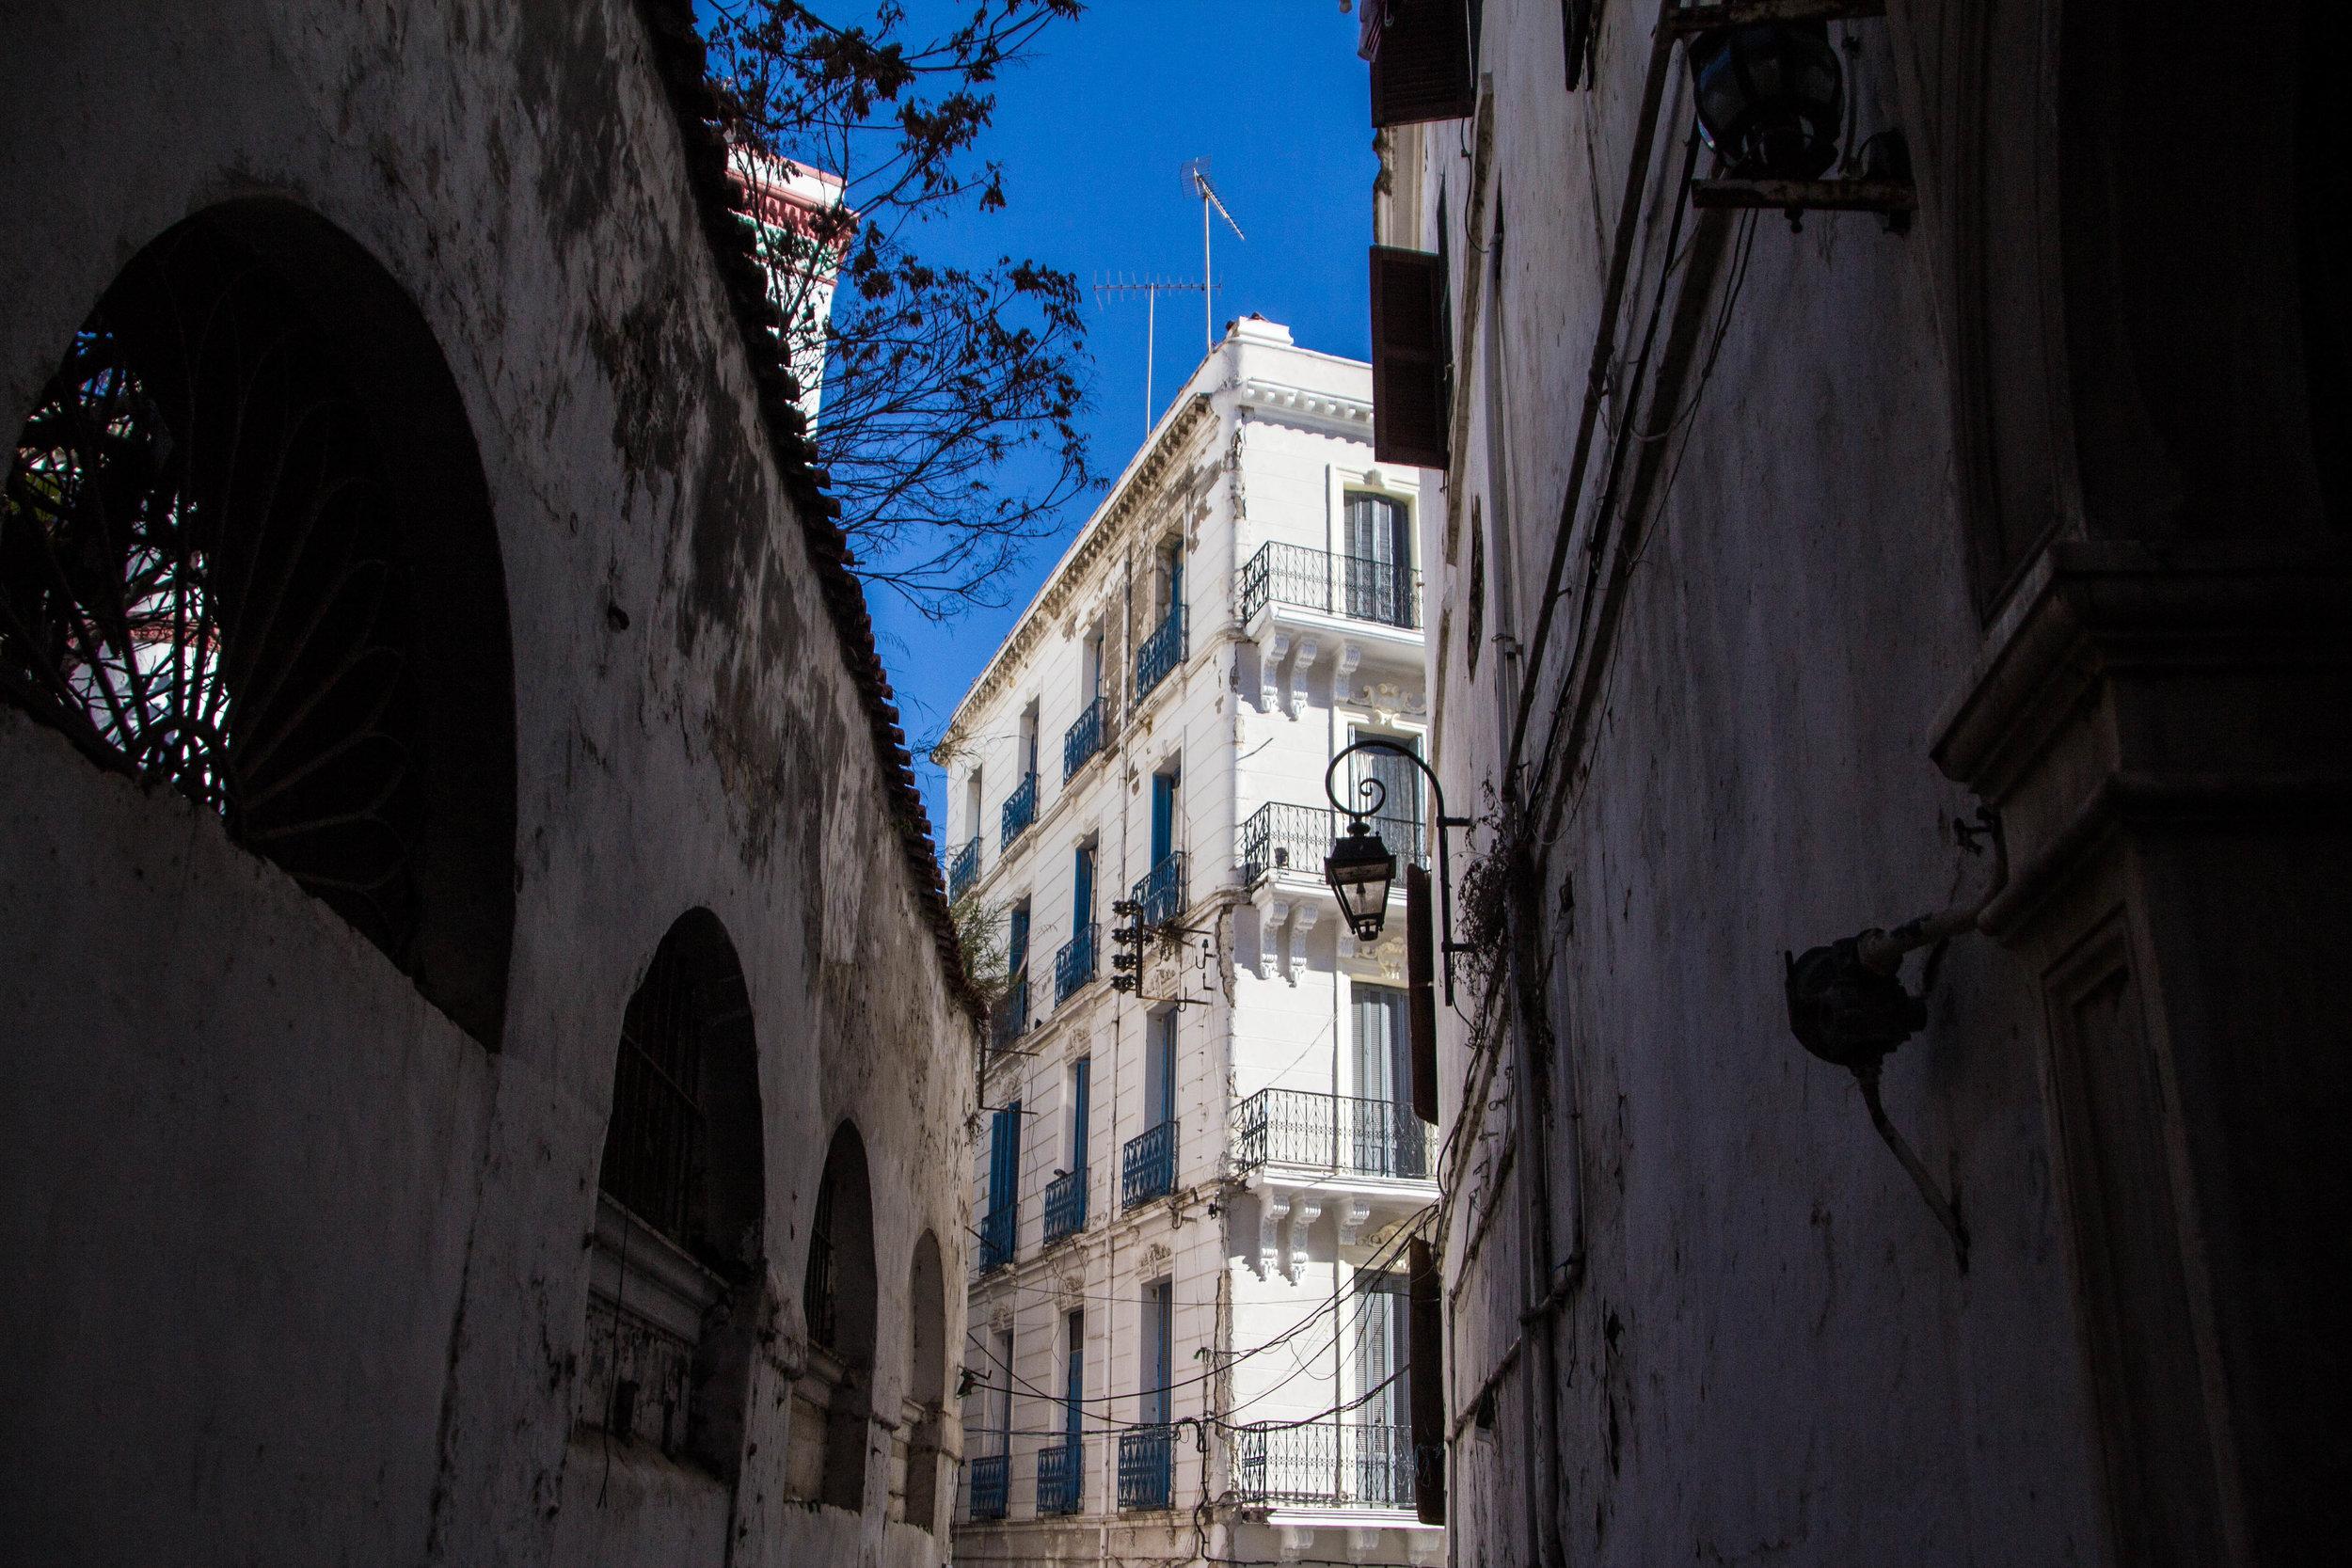 streets-algiers-algeria-alger-1.jpg